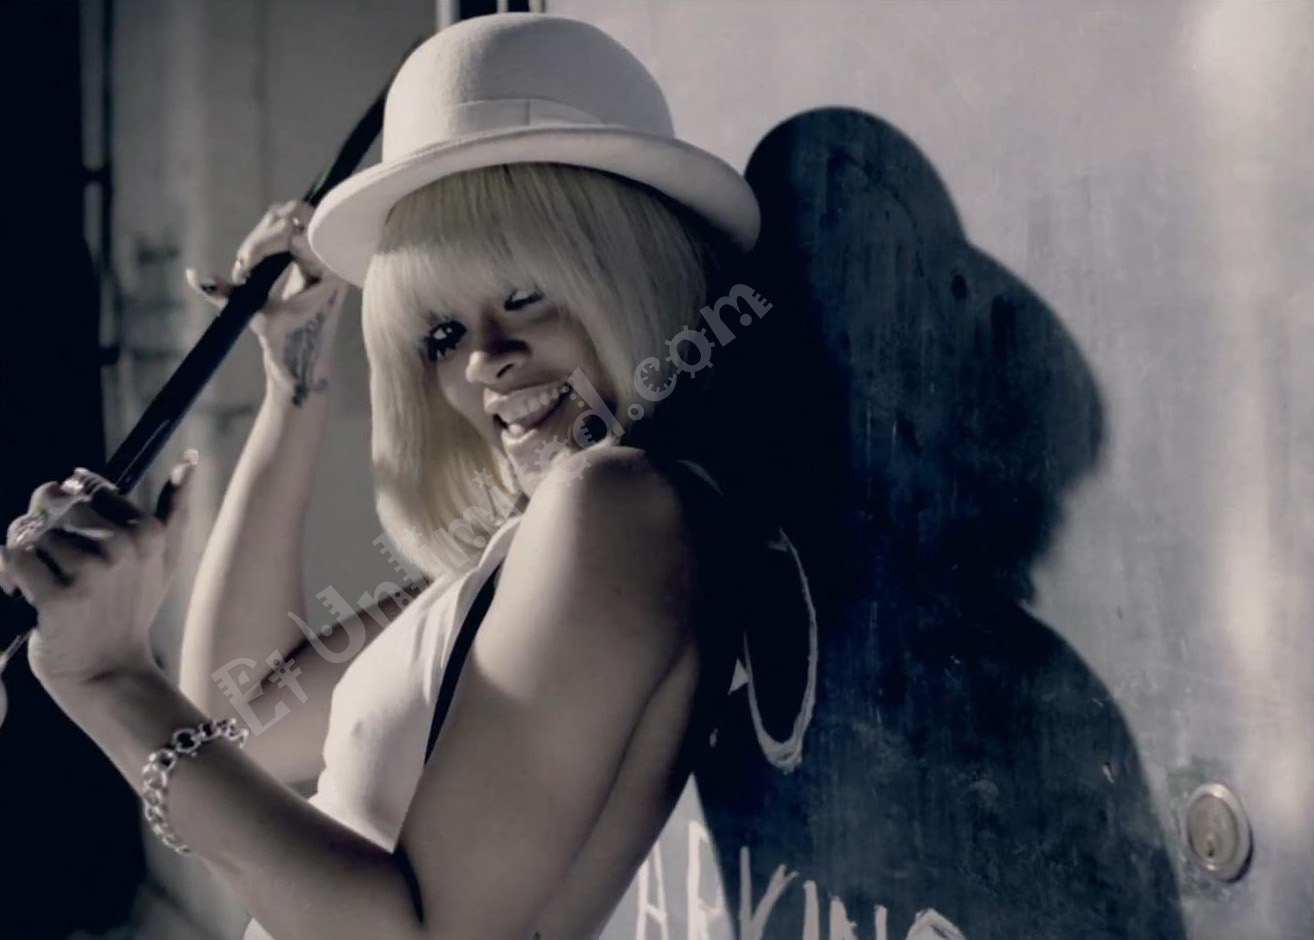 http://2.bp.blogspot.com/-4nJ2bxTJkik/TwpRYEY3-kI/AAAAAAAAALU/psDQVmm_OVk/s1600/Rihanna-You-Da-One.jpg